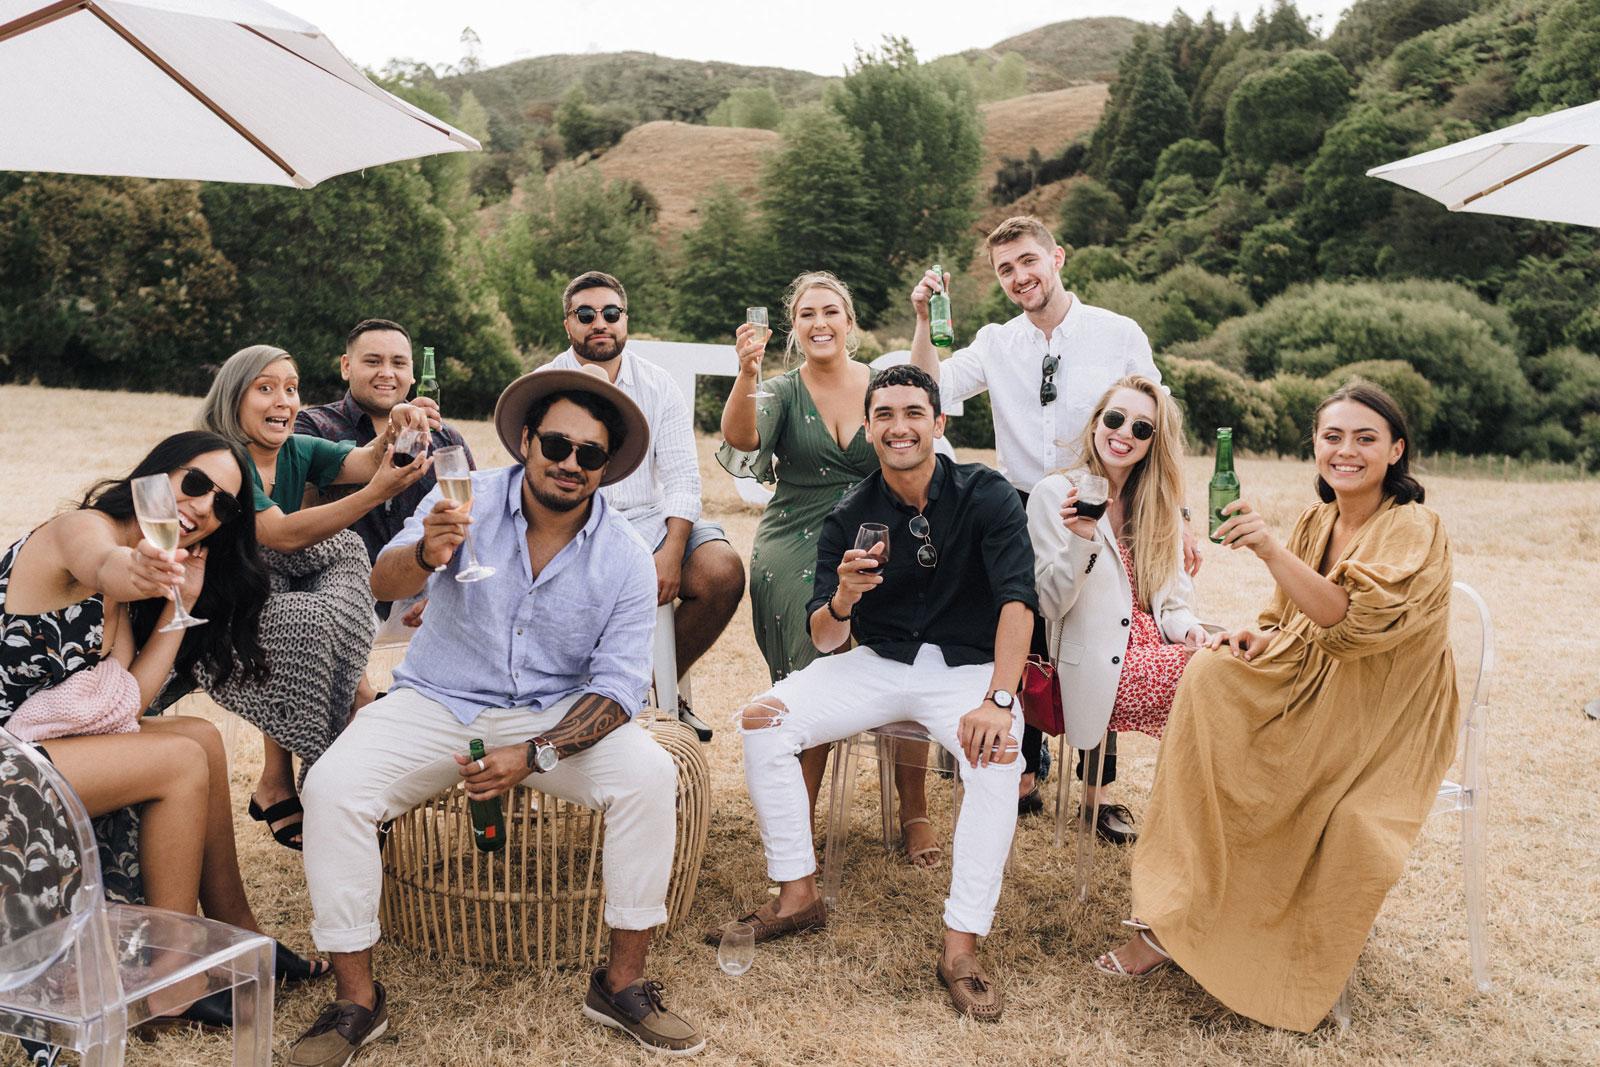 newfound-s-t-hunua-auckland-wedding-photographers-101